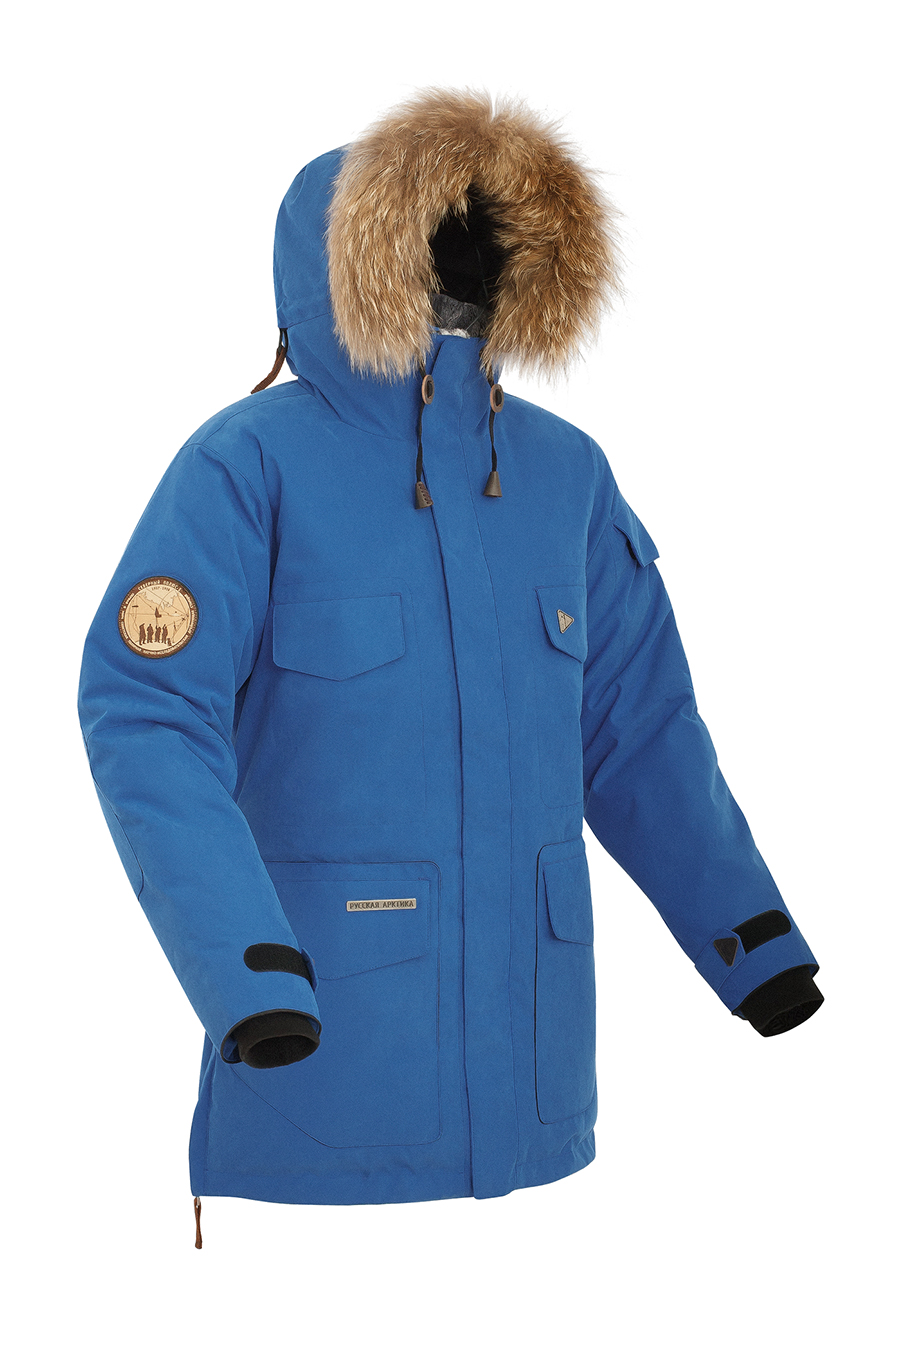 Купить Куртка пуховая BASK TAIMYR СИНИЙ ROYAL, Компания БАСК